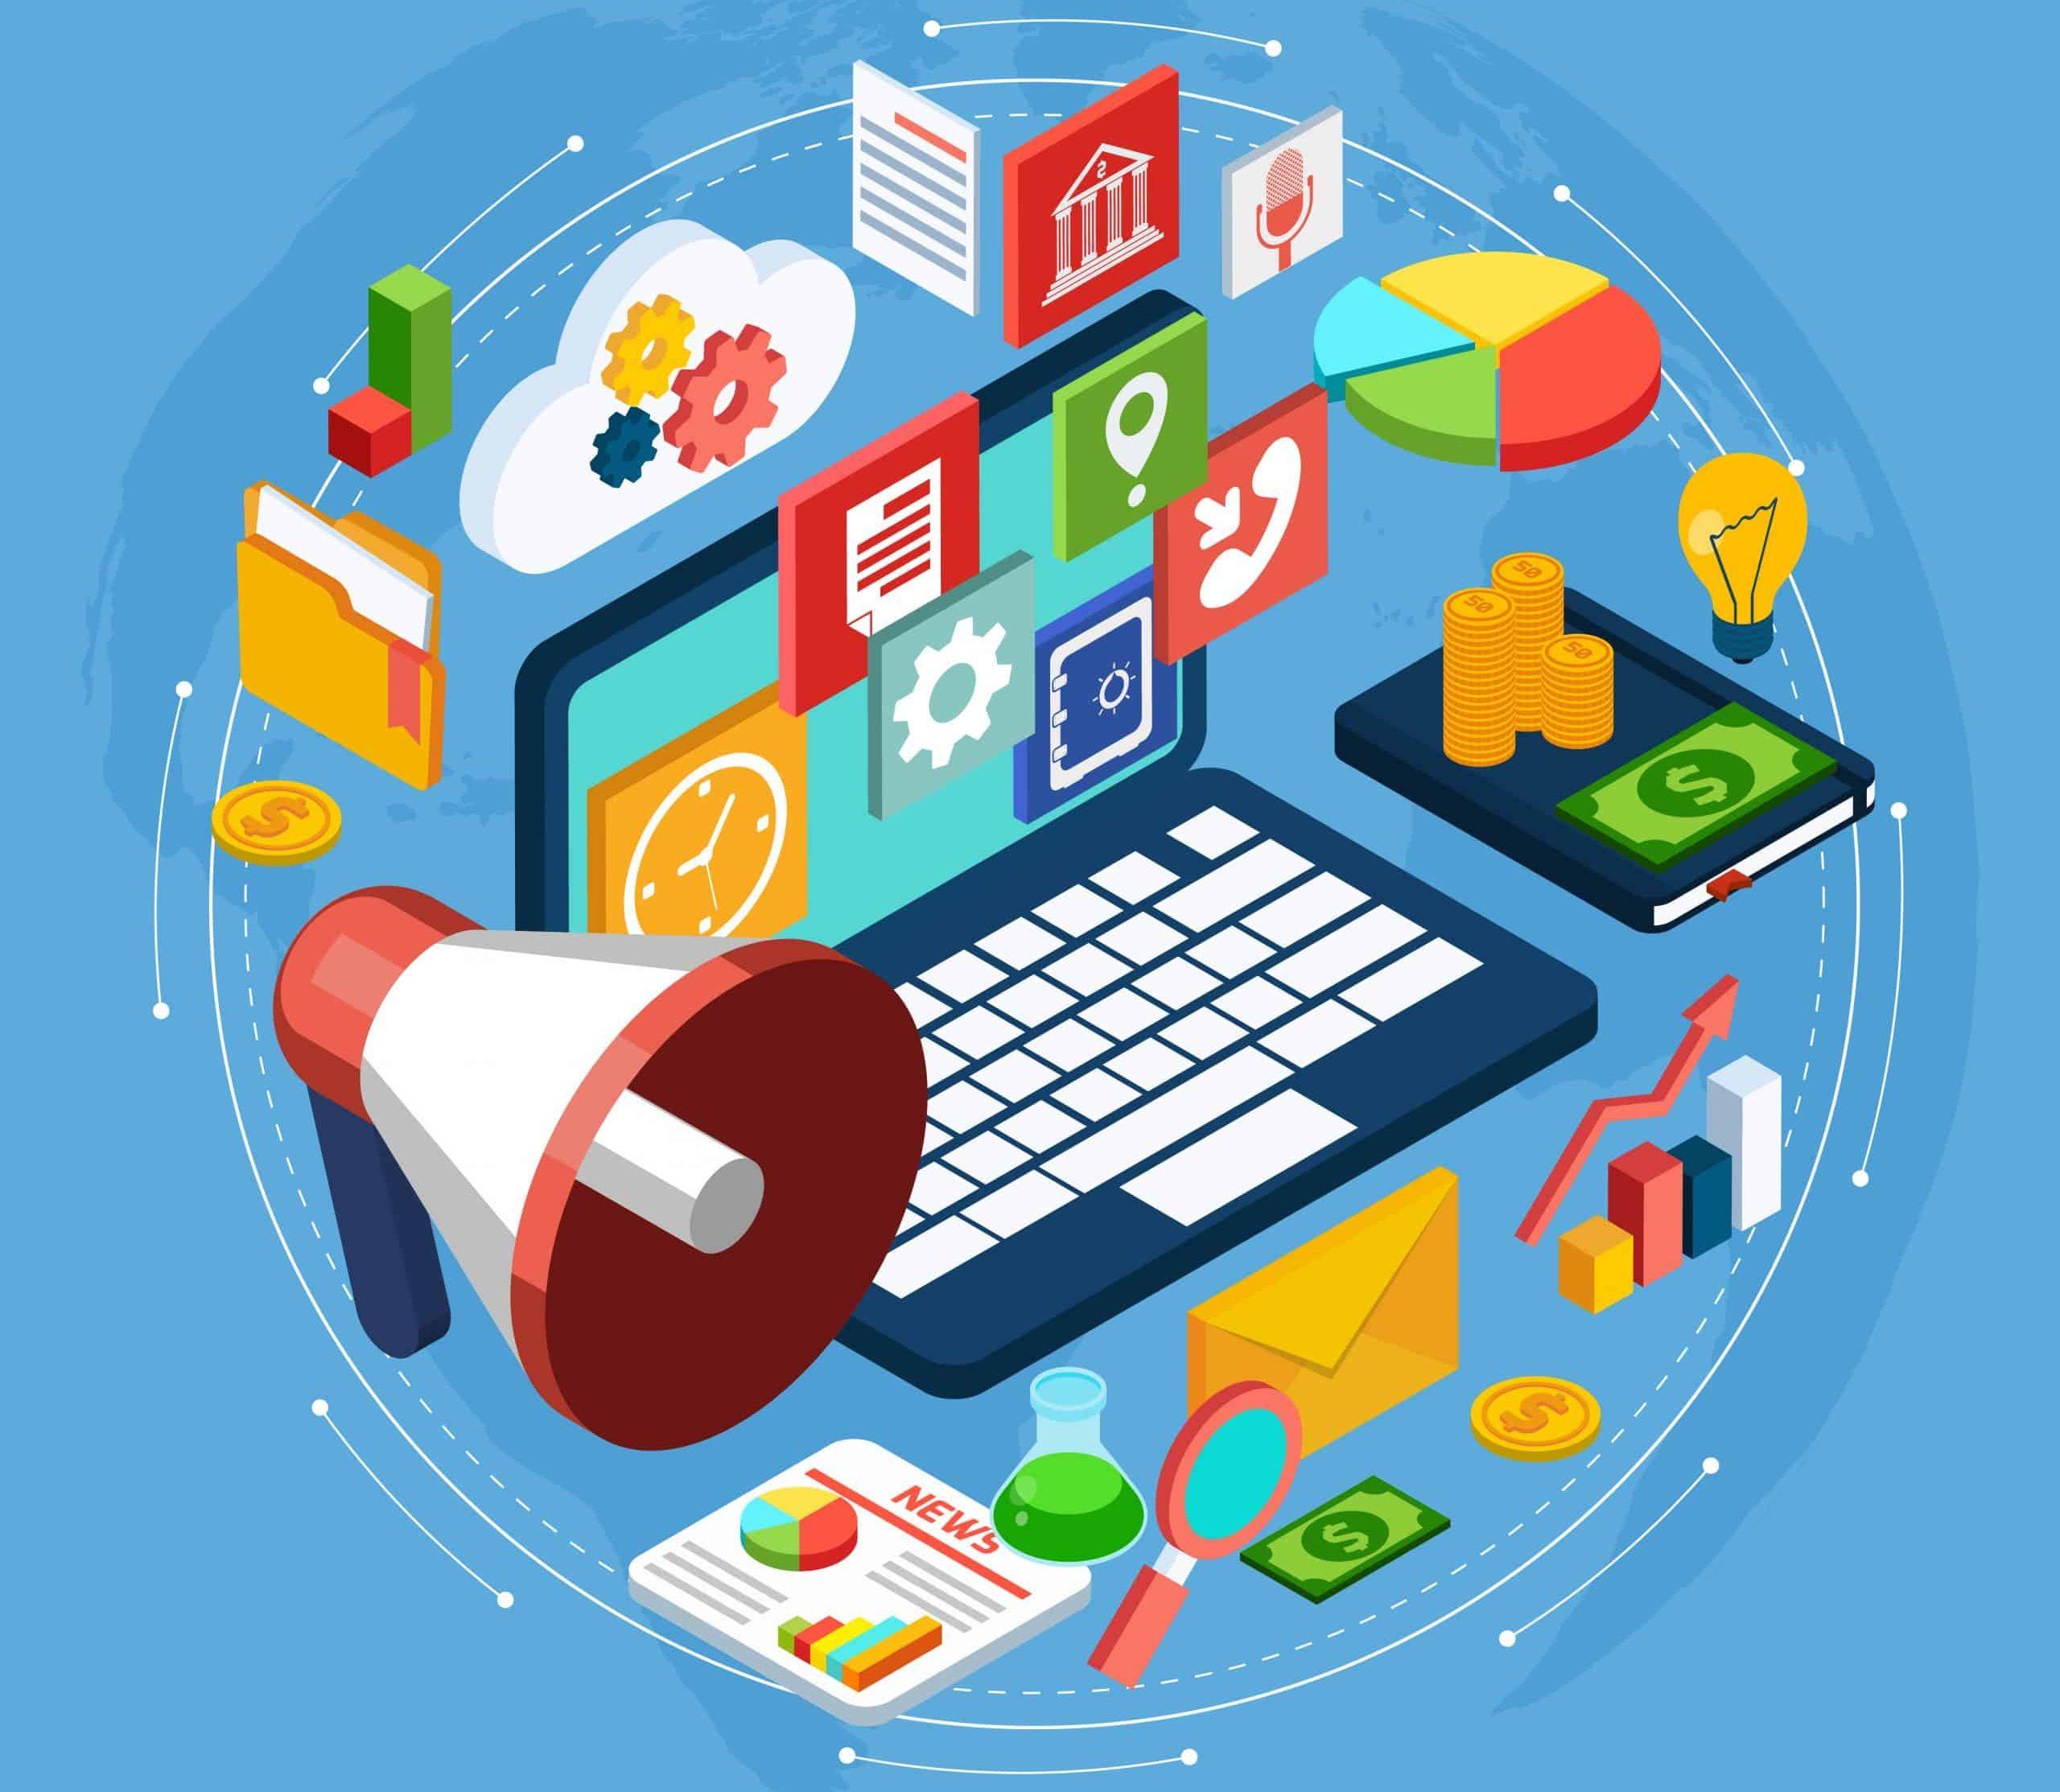 طرح بازاریابی دیجیتال